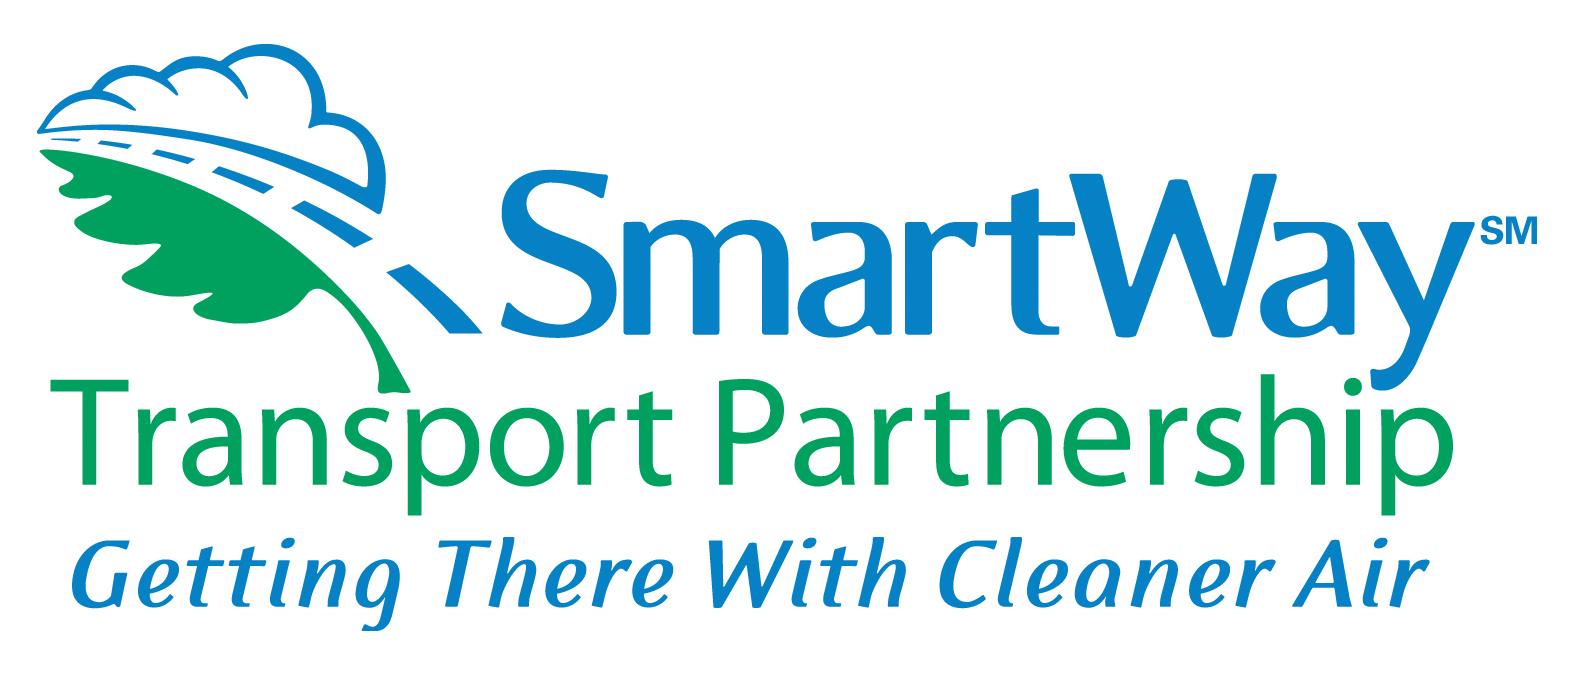 Smartway-logo.jpg